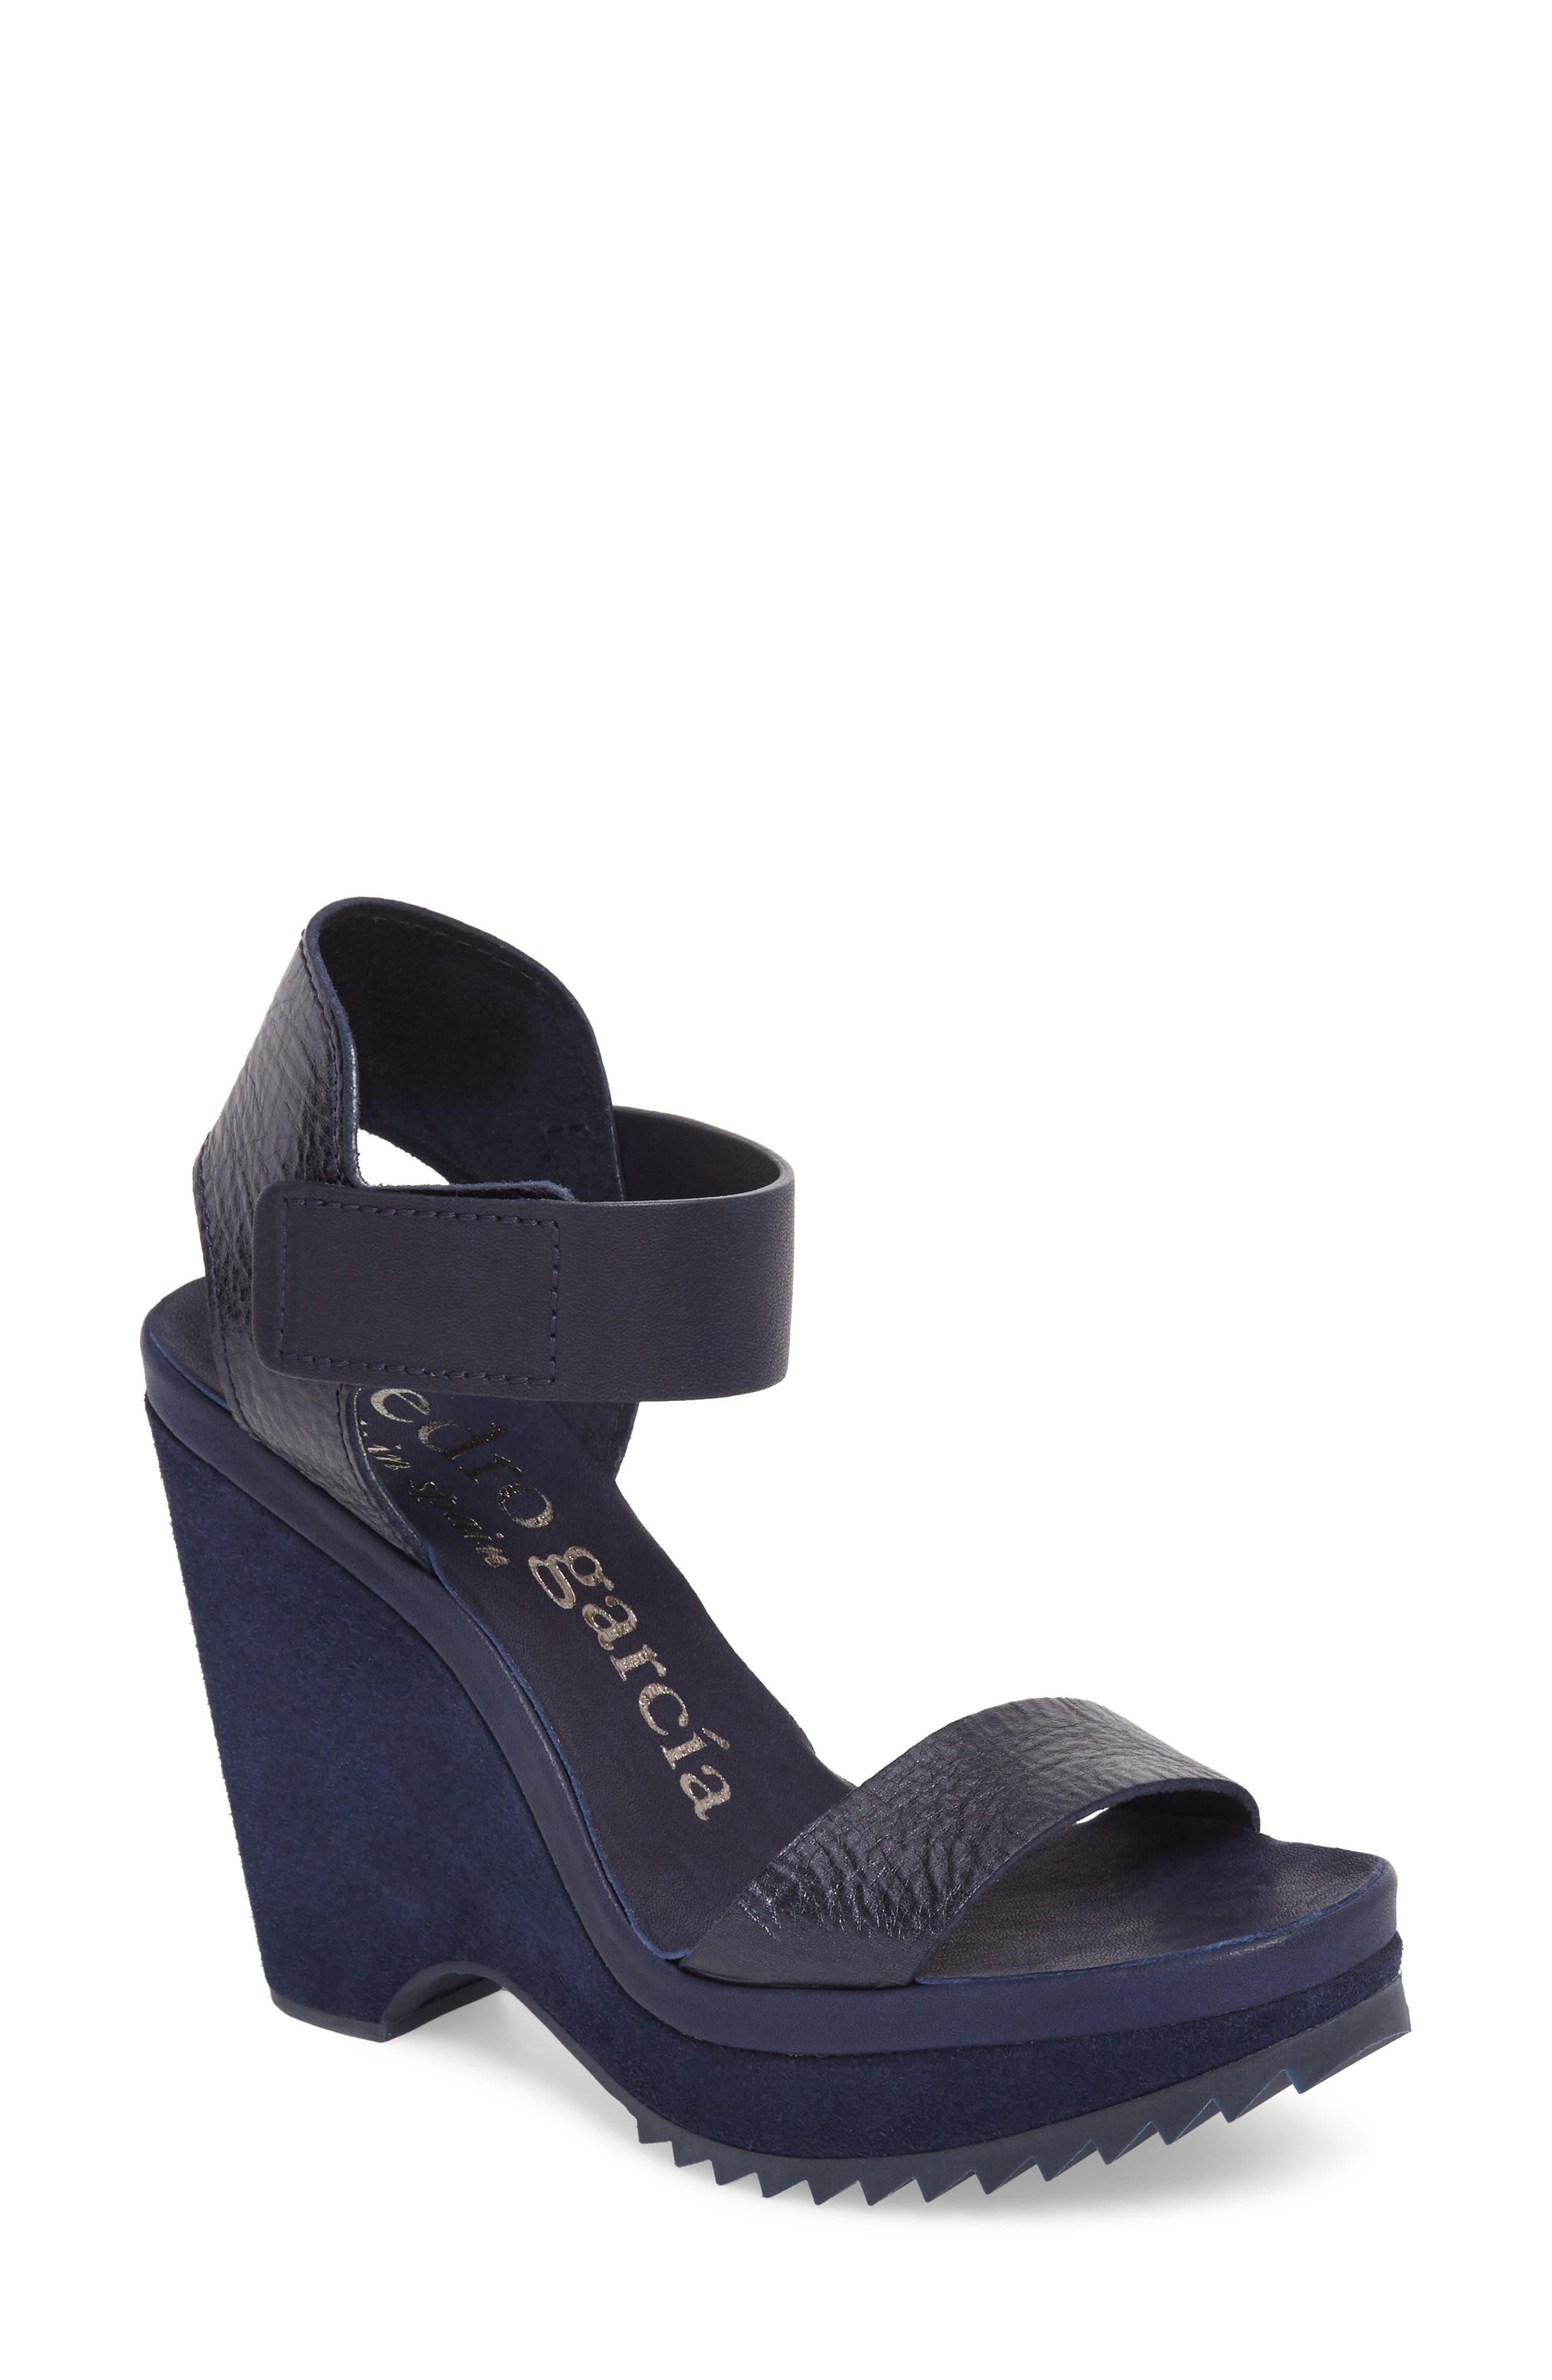 Vida Platform Wedge Sandal,                             Main thumbnail 1, color,                             MARINA